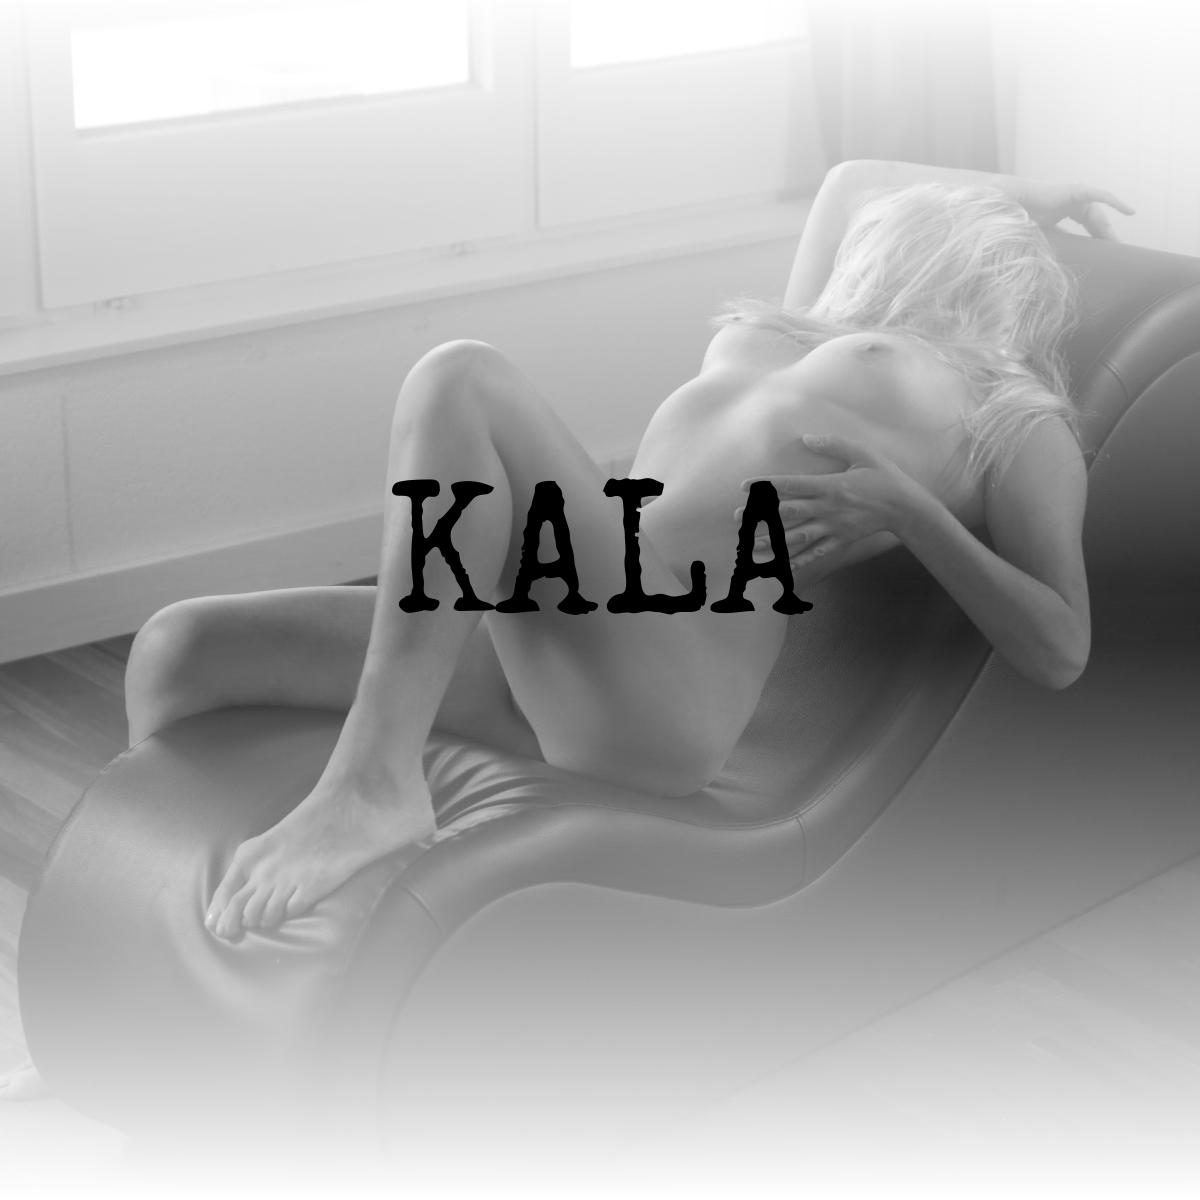 Secret Tantra - Kala - Kategorie